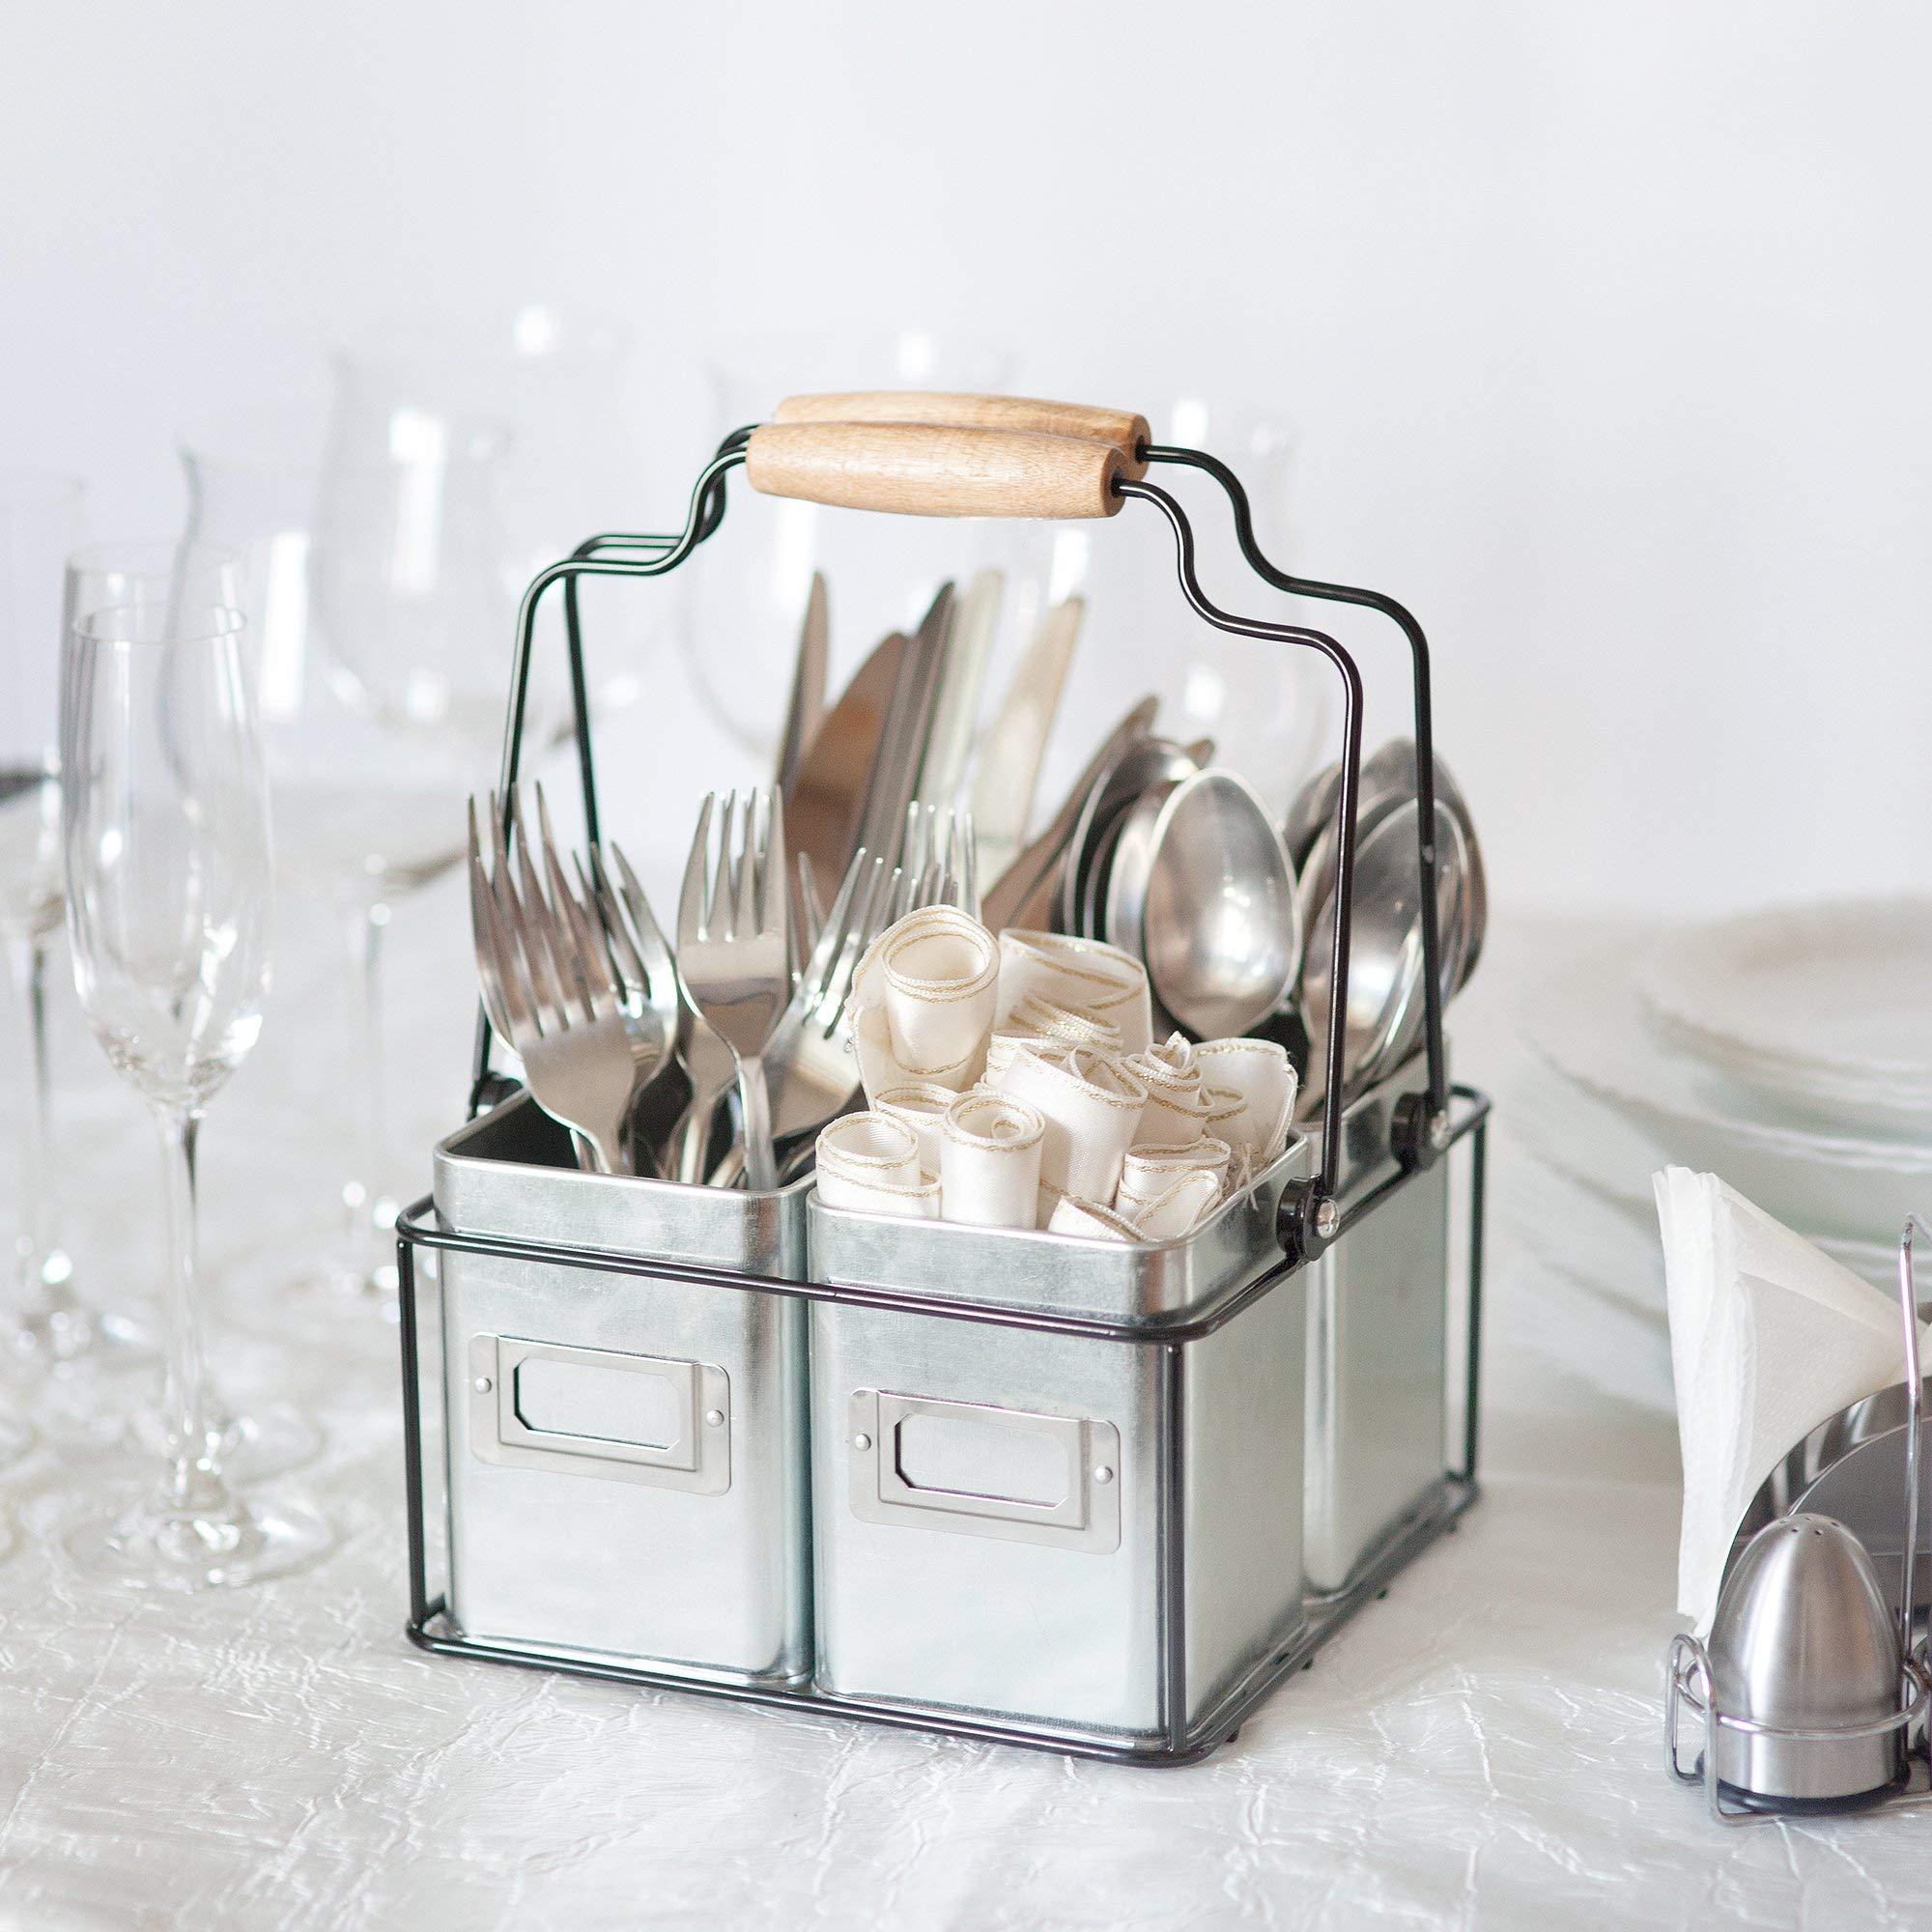 Kenley Galvanized Tin Caddy - Utensil Holder Organizer for Kids & Art Supplies, Kitchen Silverware, Napkins, Flatware, Condiments - Farmhouse Vintage Rustic Décor Picnic Tray with Handles & Metal Bins